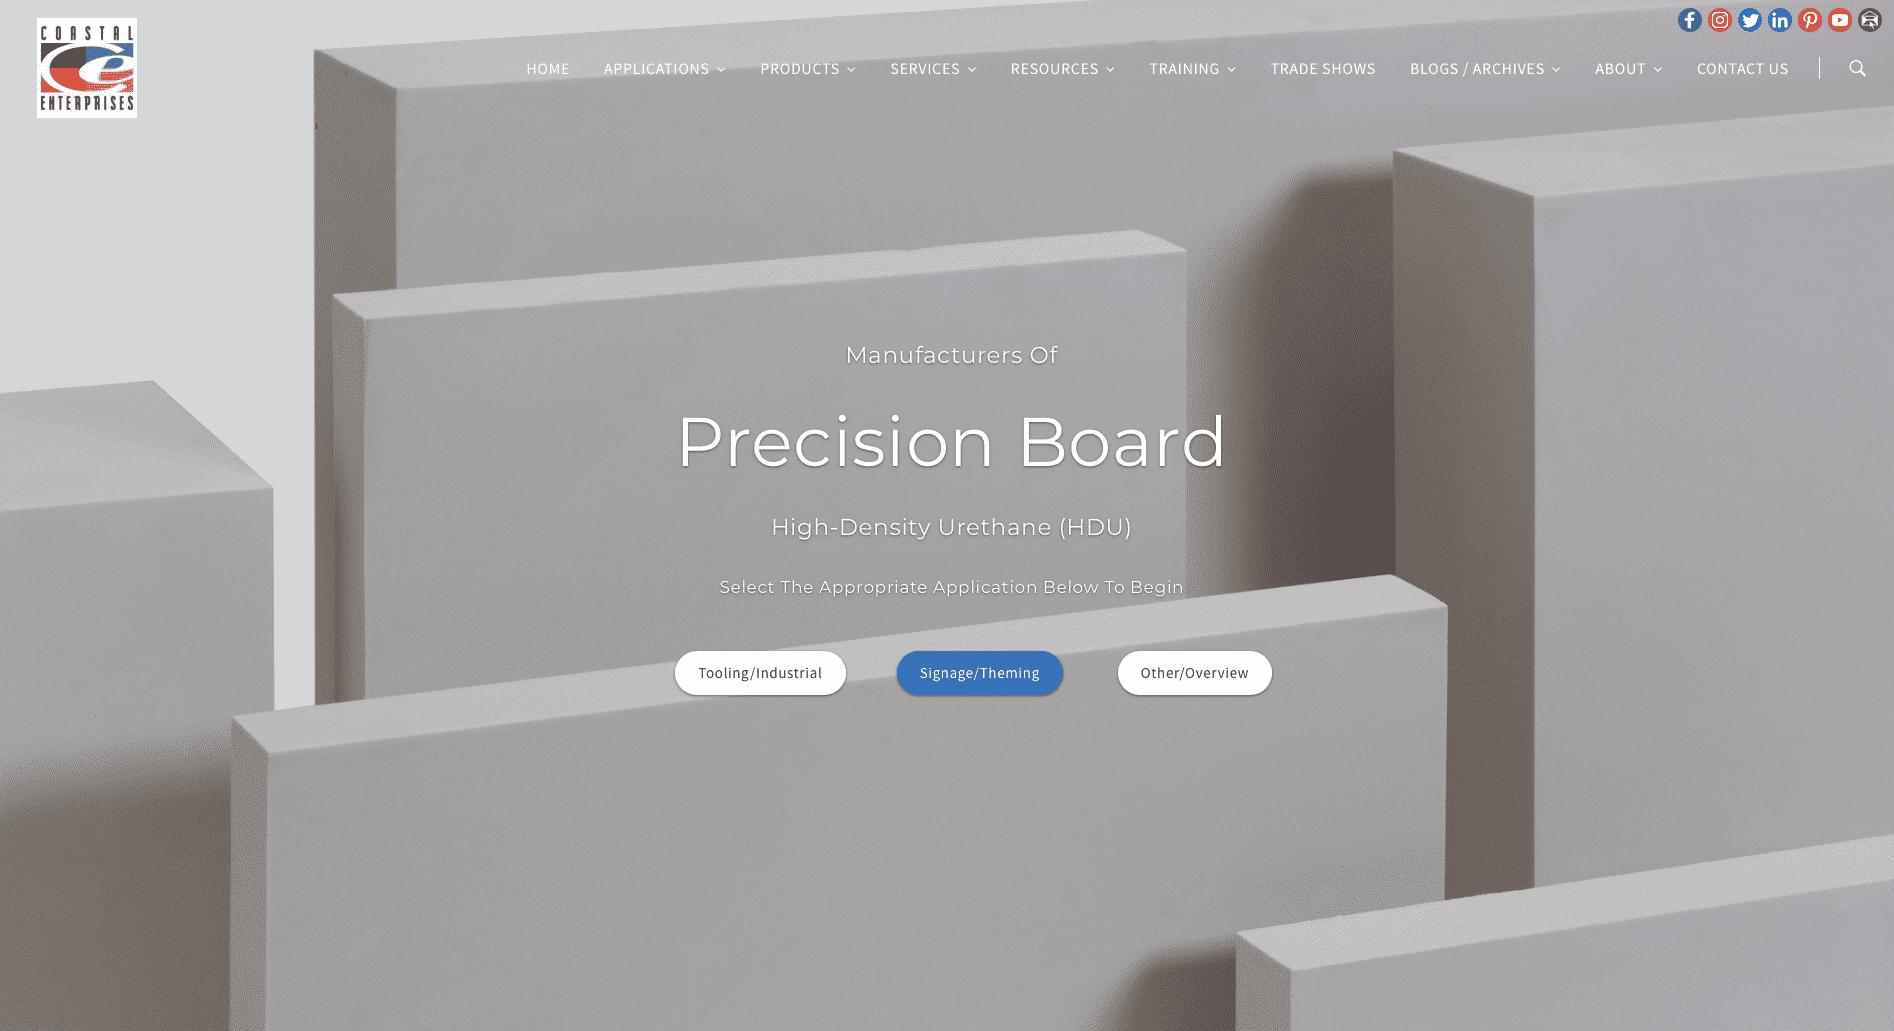 precisionboard.com